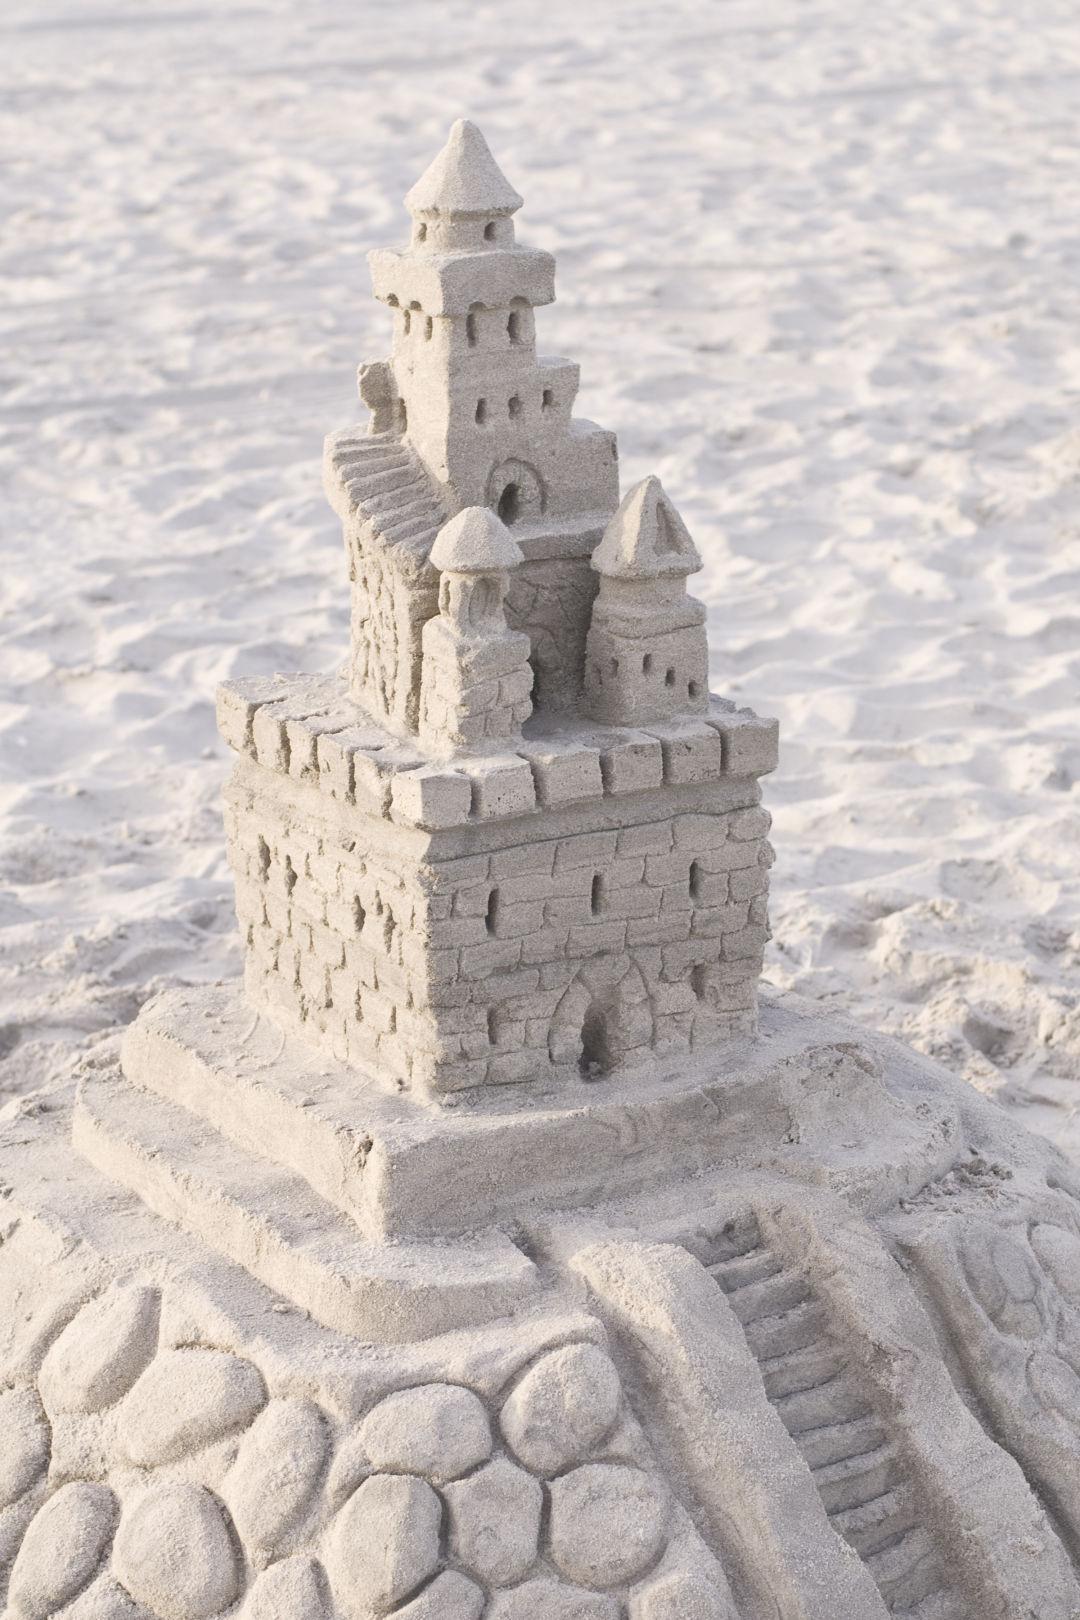 Sandcastle k9hnfk